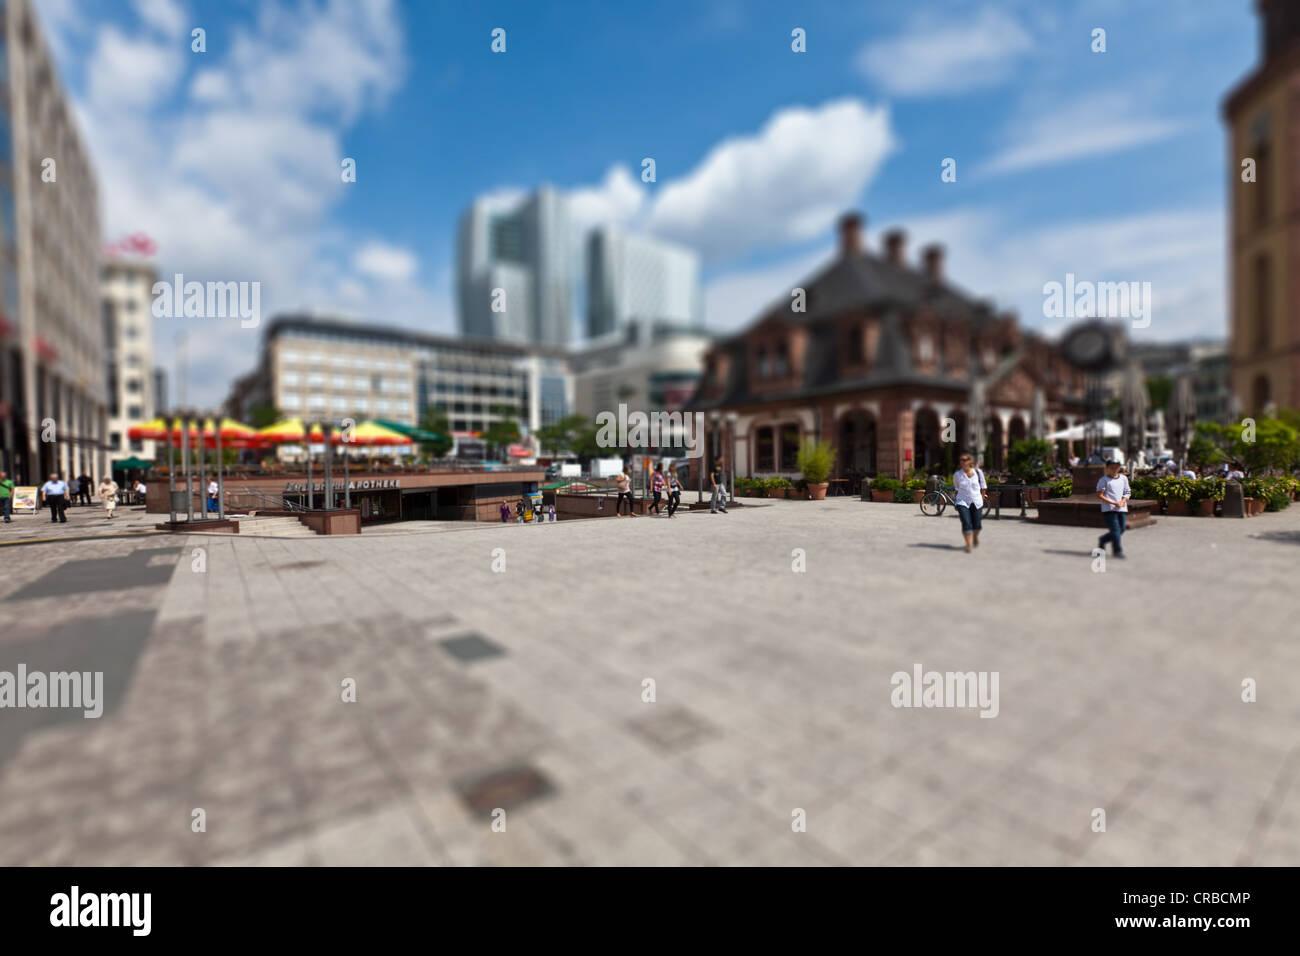 Operncafe coffeehouse, miniature view, tilt-shift effect, reduced depth of field, Frankfurt am Main, Hesse, Germany, - Stock Image